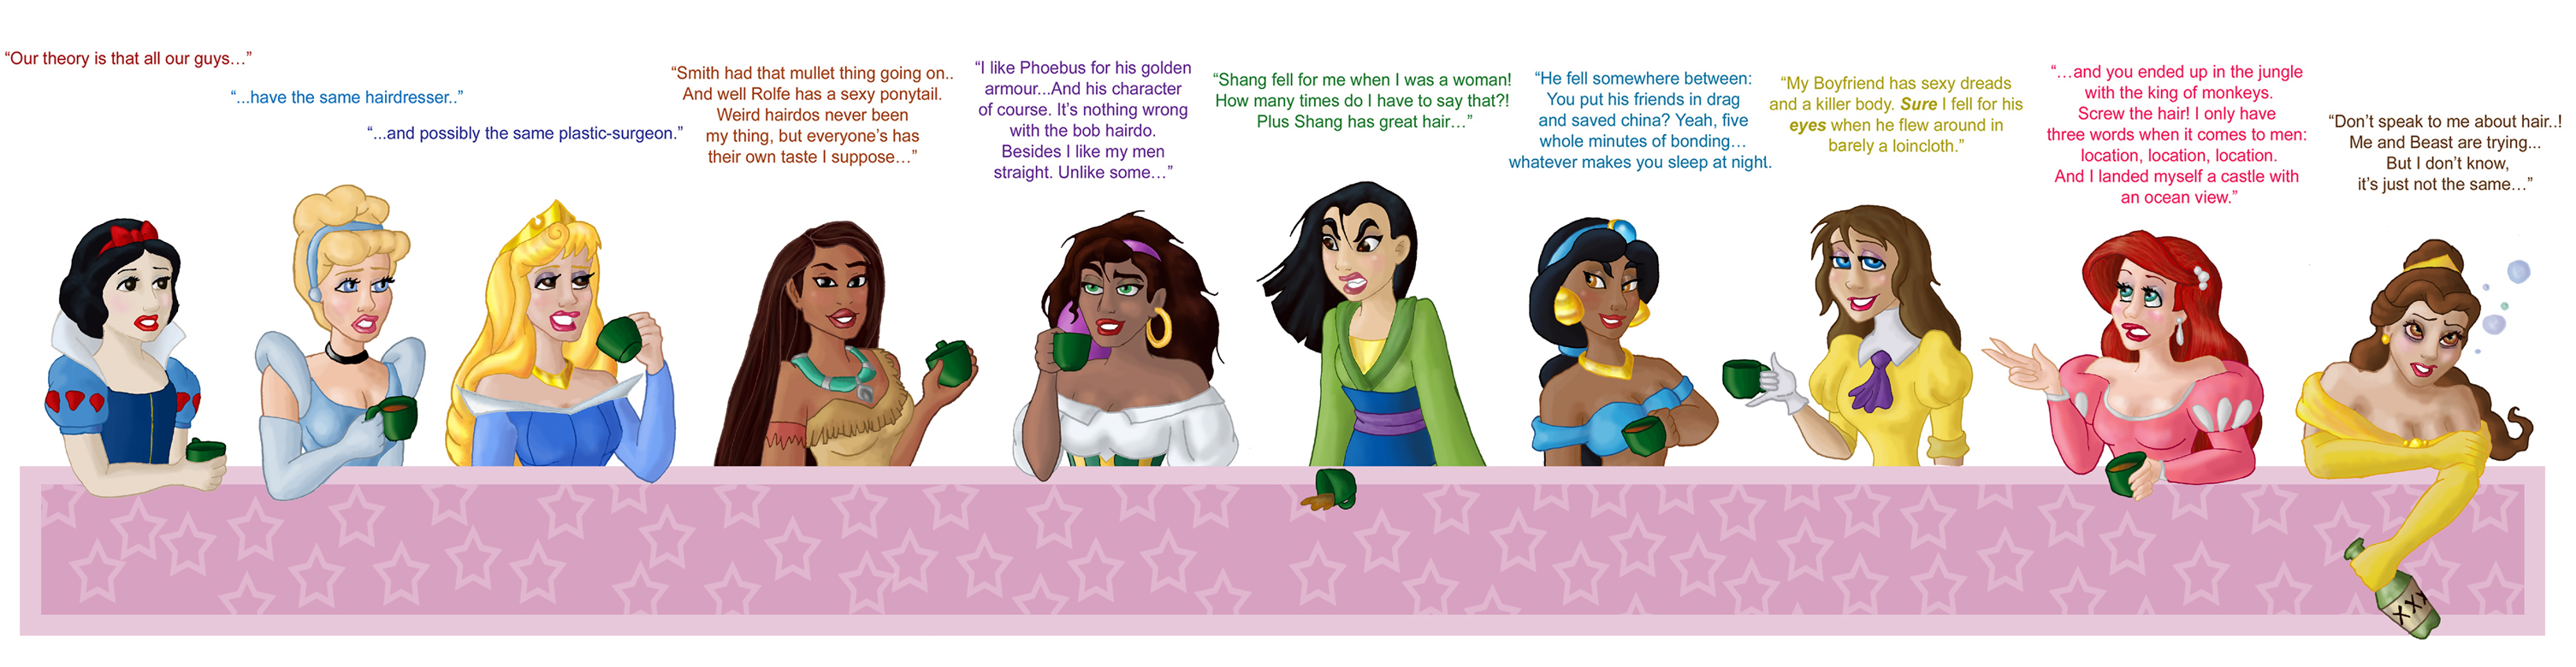 Disney Women by Morloth88